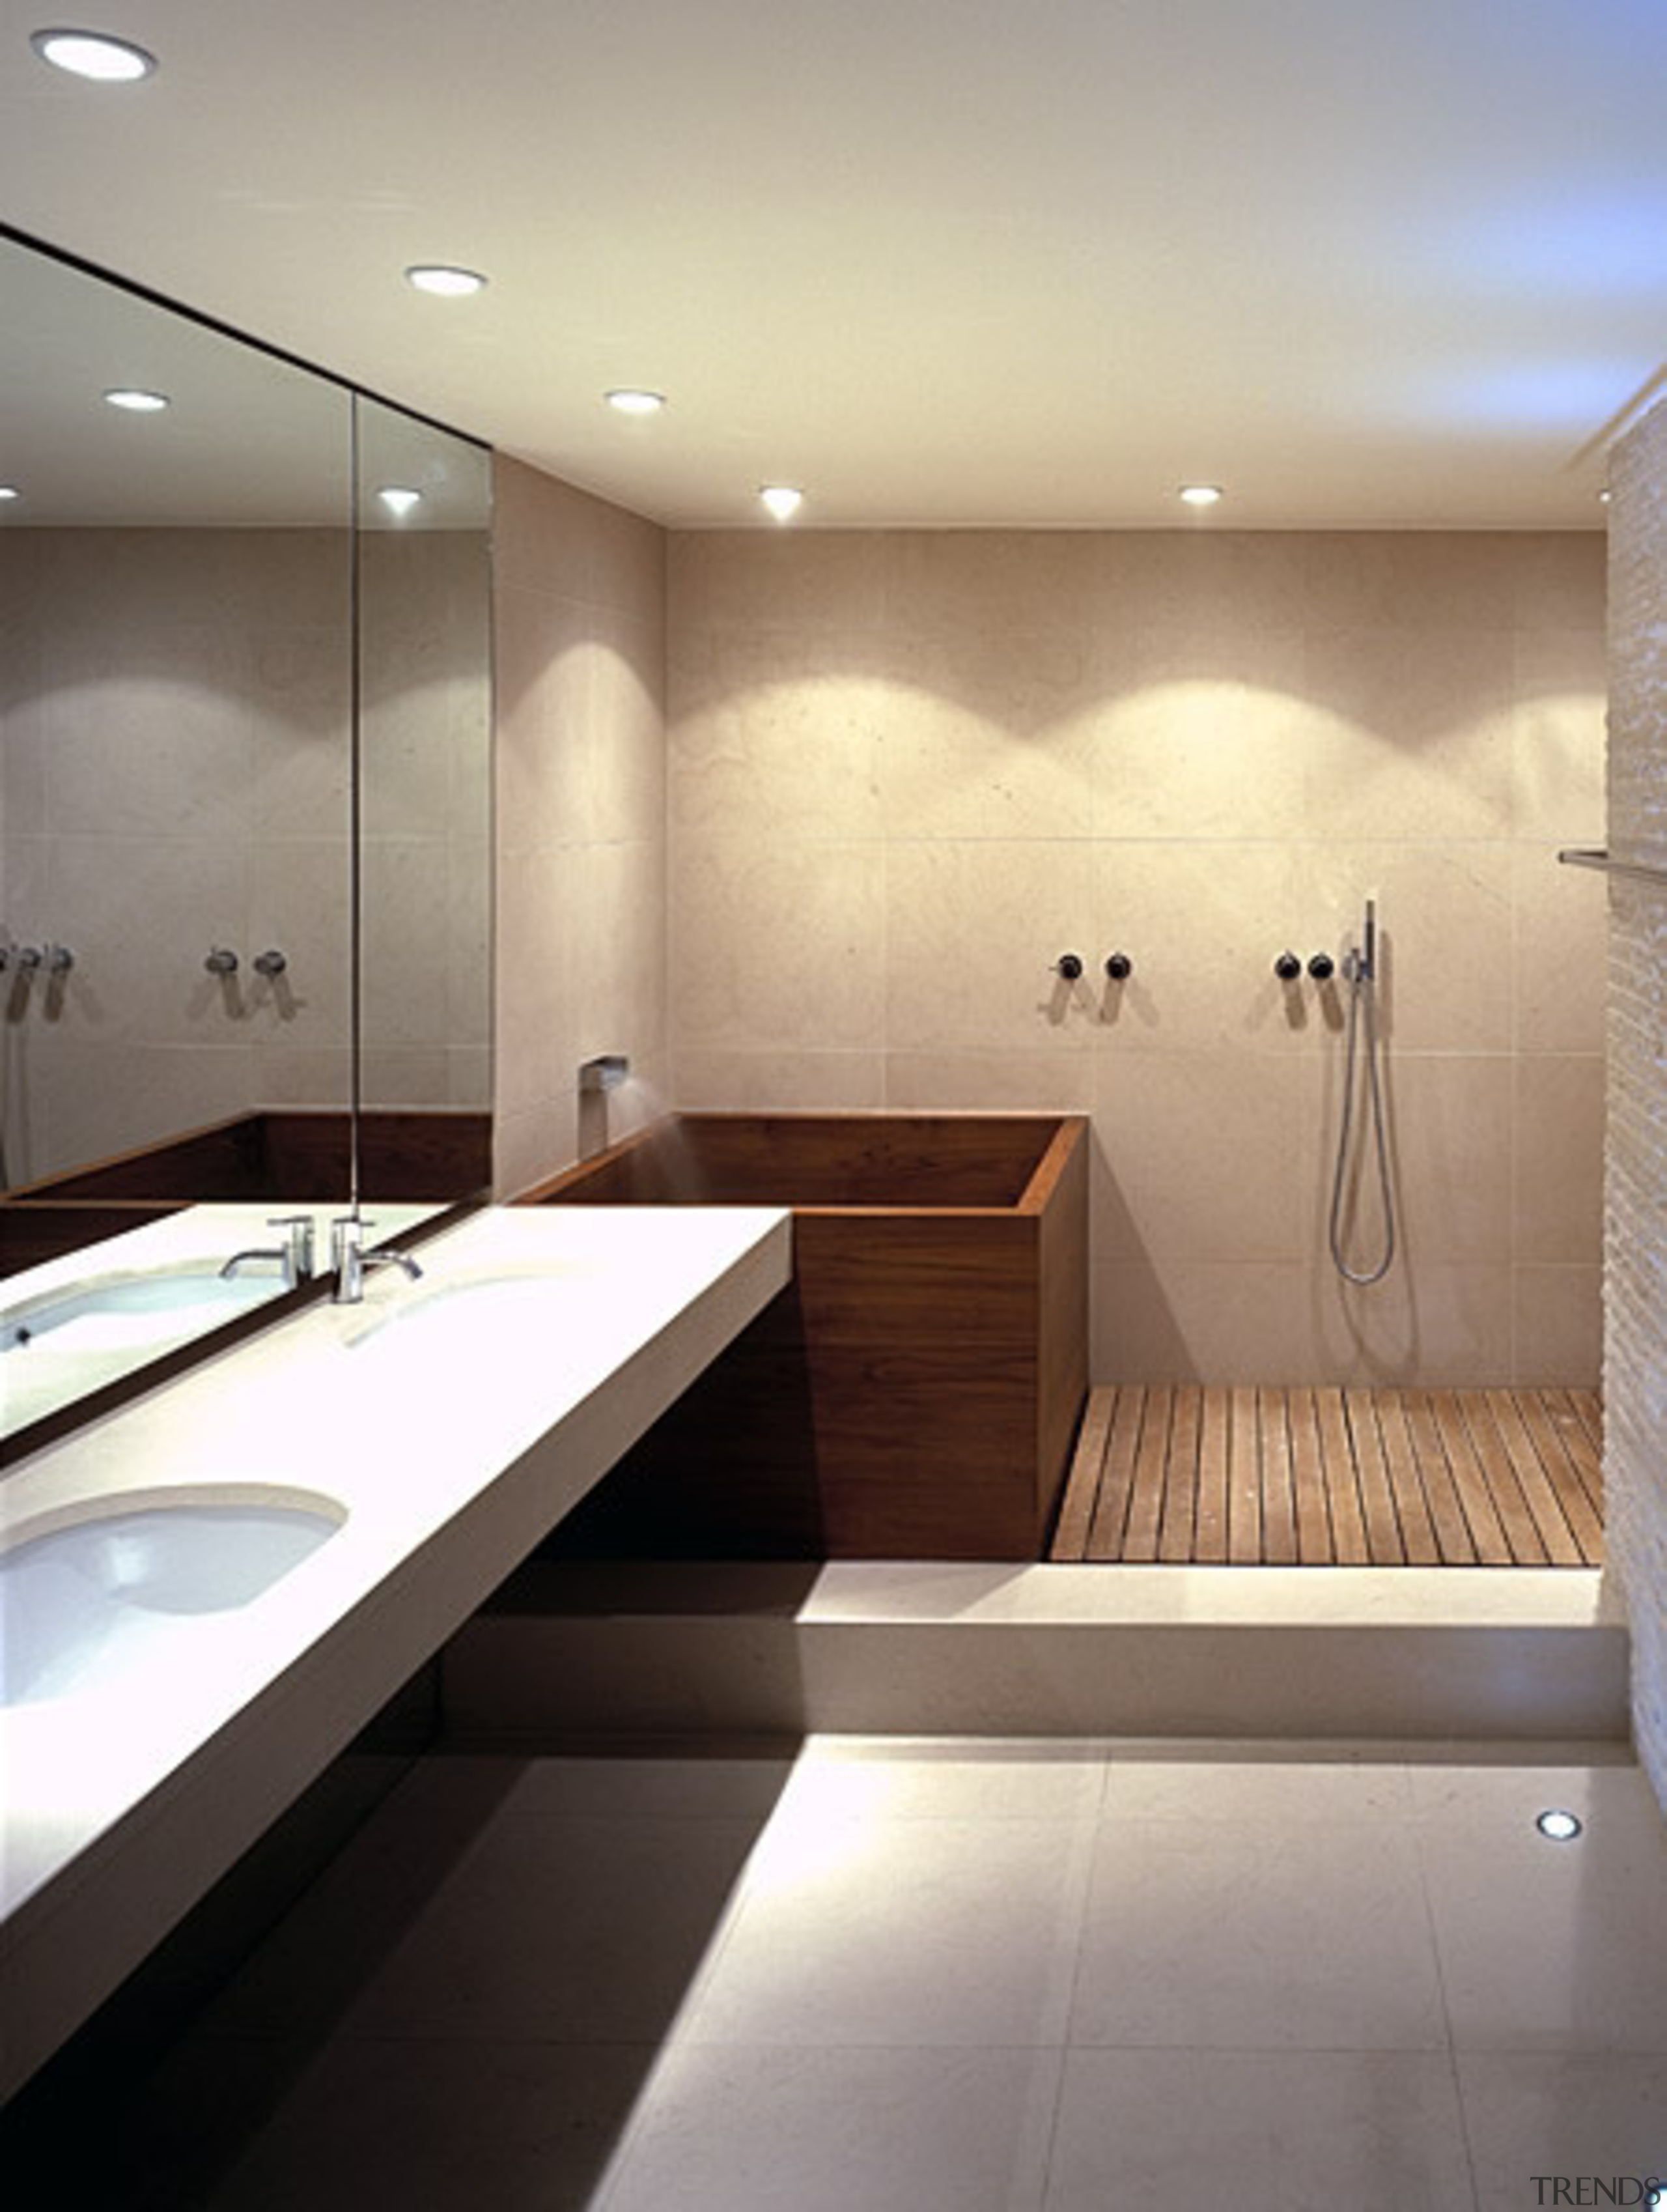 2019 bathroom furniture trends - architecture   bathroom architecture, bathroom, bathtub, building, ceiling, floor, flooring, house, interior design, lighting, material property, plumbing fixture, property, room, tap, tile, gray